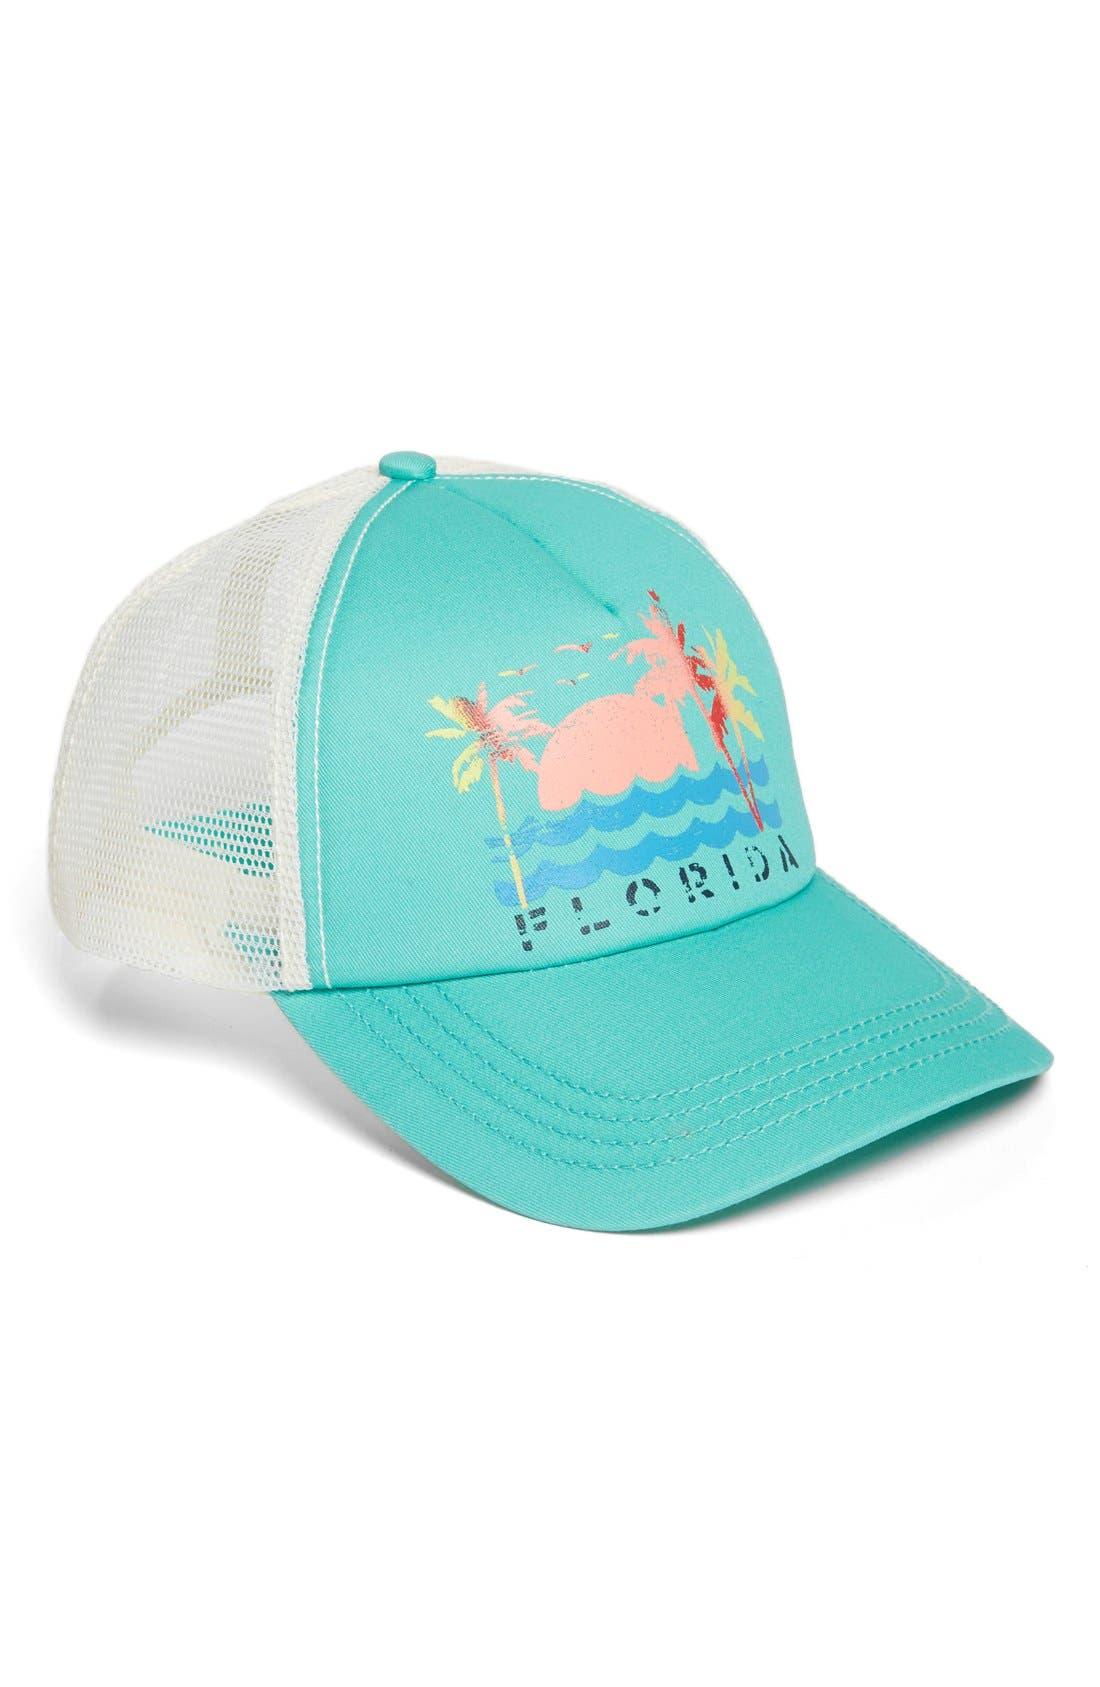 Alternate Image 1 Selected - Billabong 'Destination Vacay' Graphic Trucker Hat